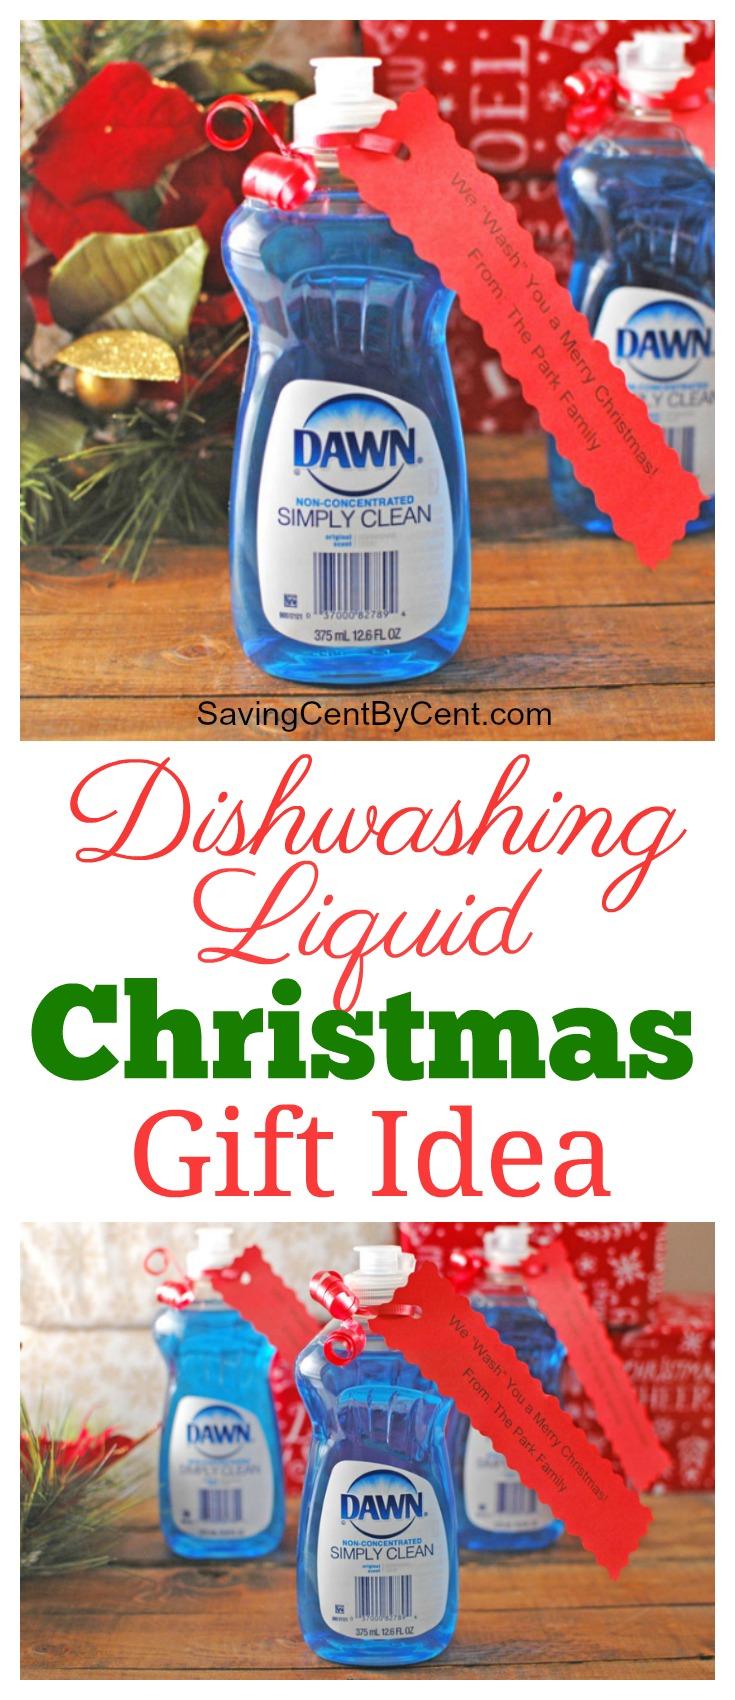 Dishwashing Liquid Christmas Gift Idea